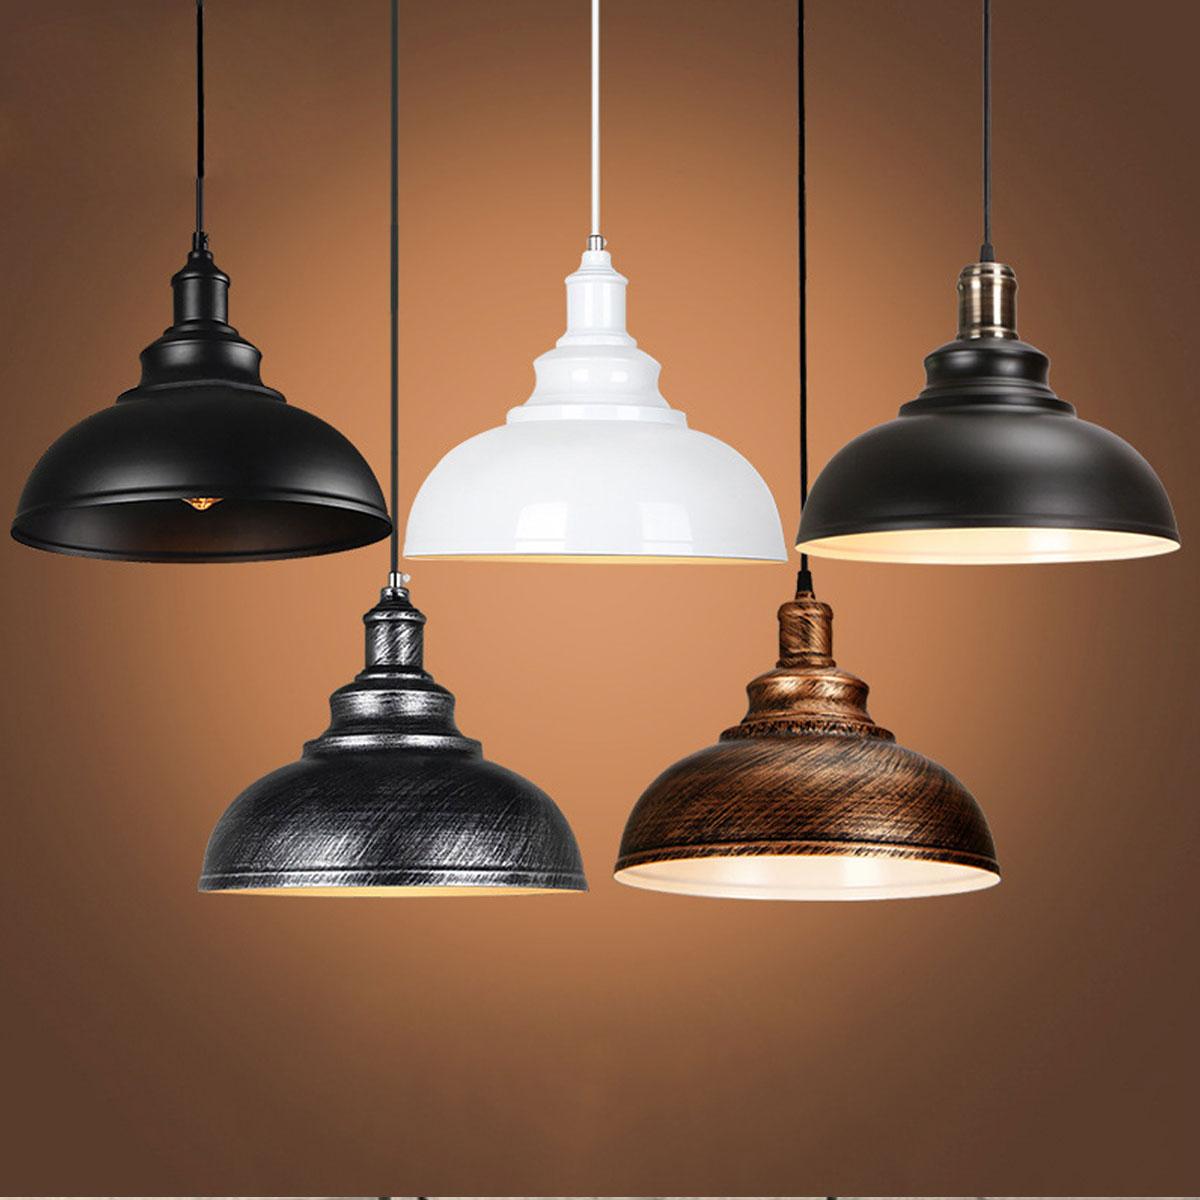 Vintage E27 Pendant Lights Iron Loft Retro Lamp Nordic Hanging Restaurant Kitchen Bar Luminaire Industrial Wind Rust LampsVintage E27 Pendant Lights Iron Loft Retro Lamp Nordic Hanging Restaurant Kitchen Bar Luminaire Industrial Wind Rust Lamps